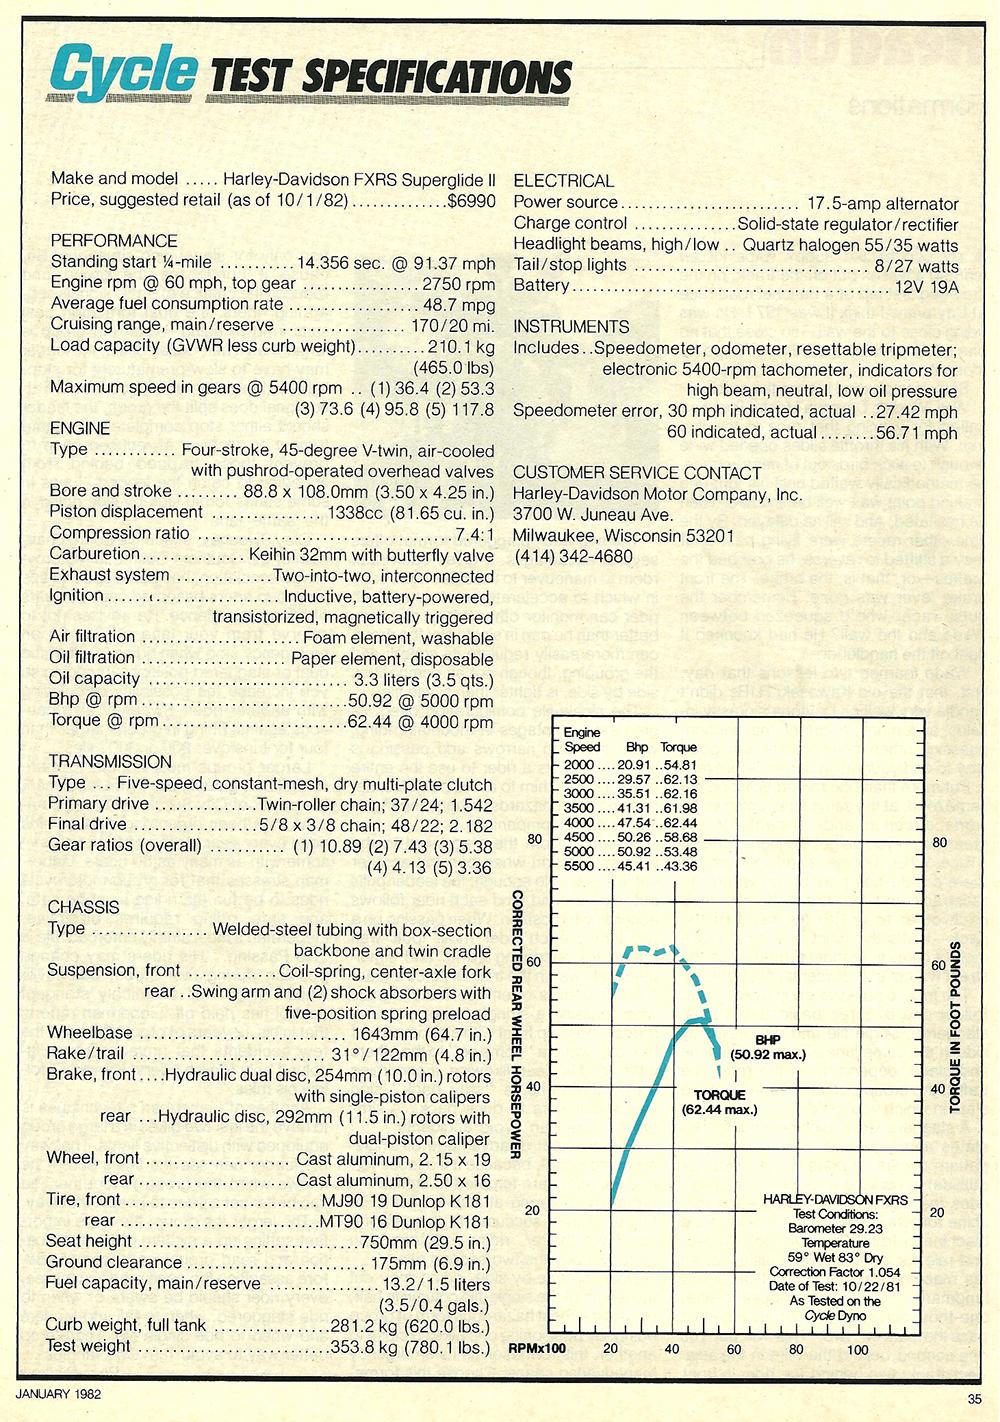 1982 Harley-Davidson FXRS road test 08.jpg